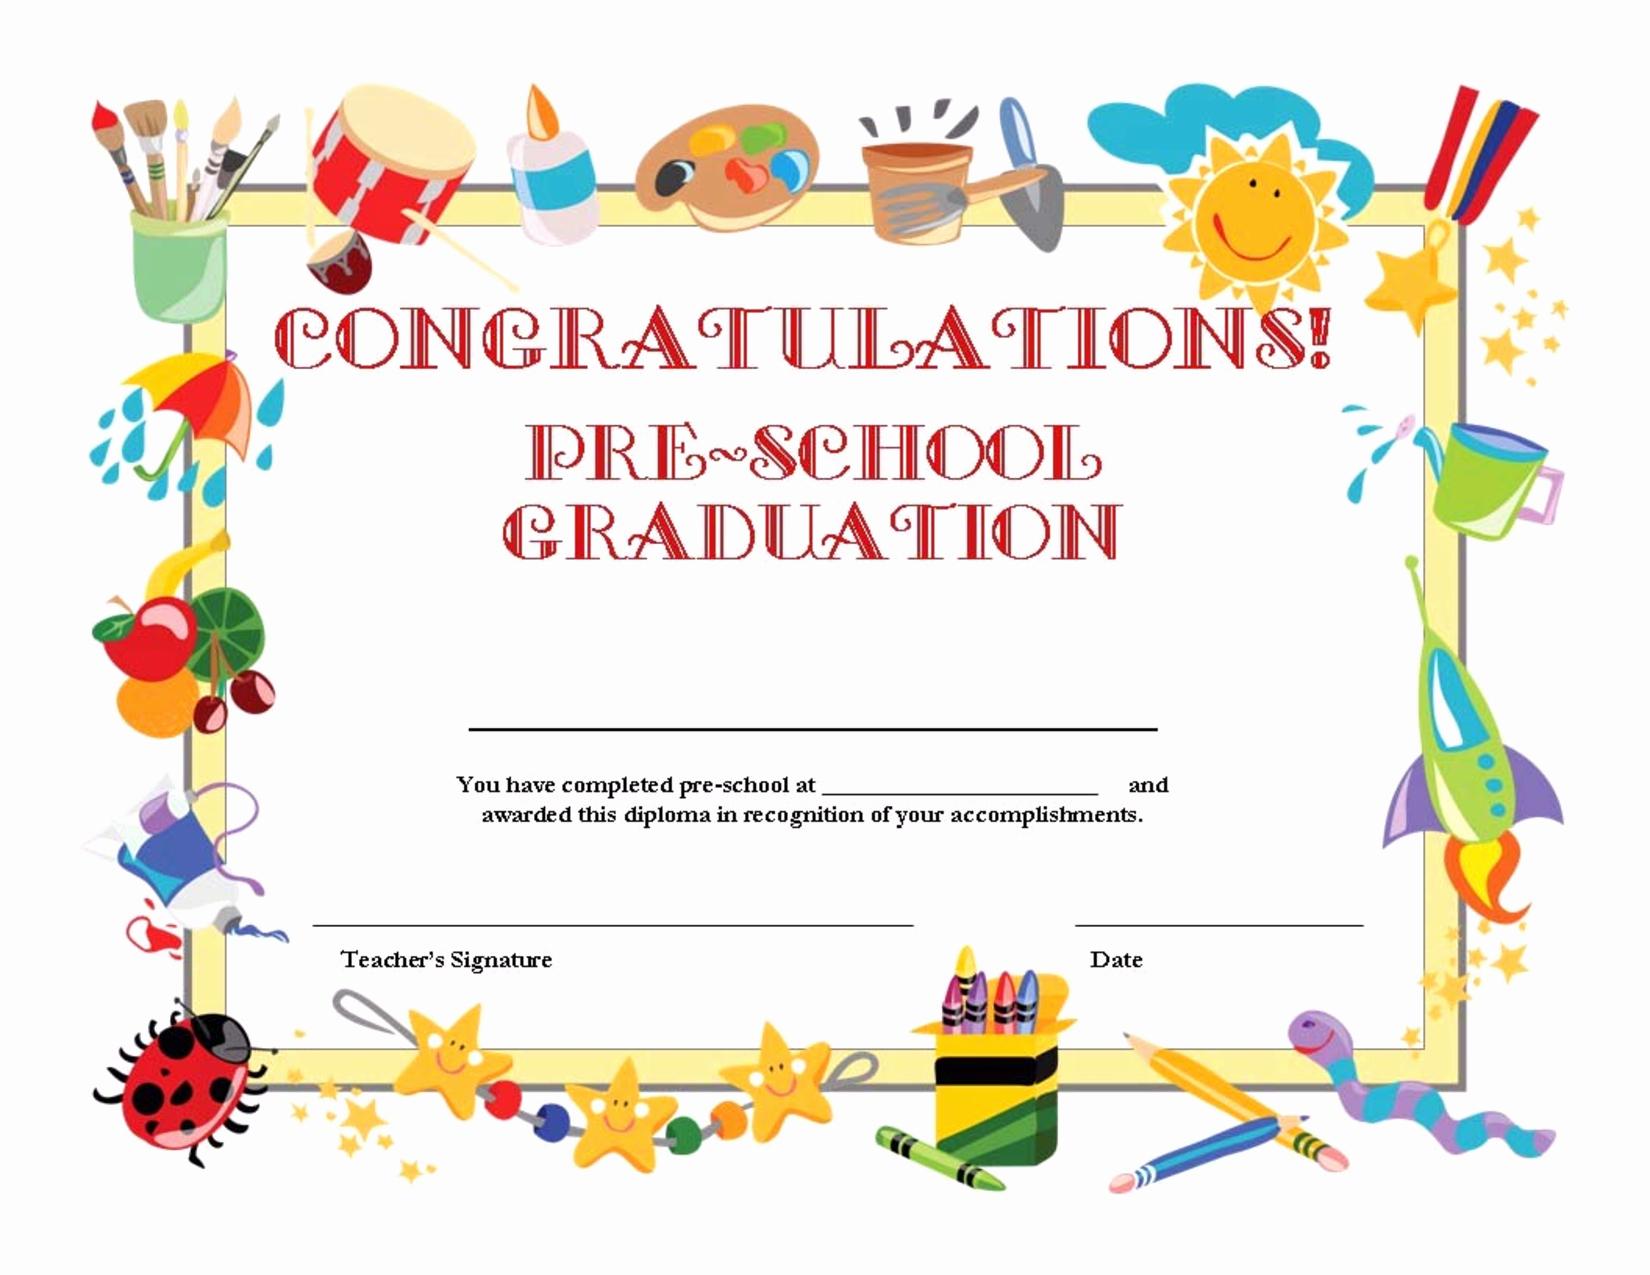 Free Preschool Certificate Template Inspirational Preschool Graduation Certificate Template Free